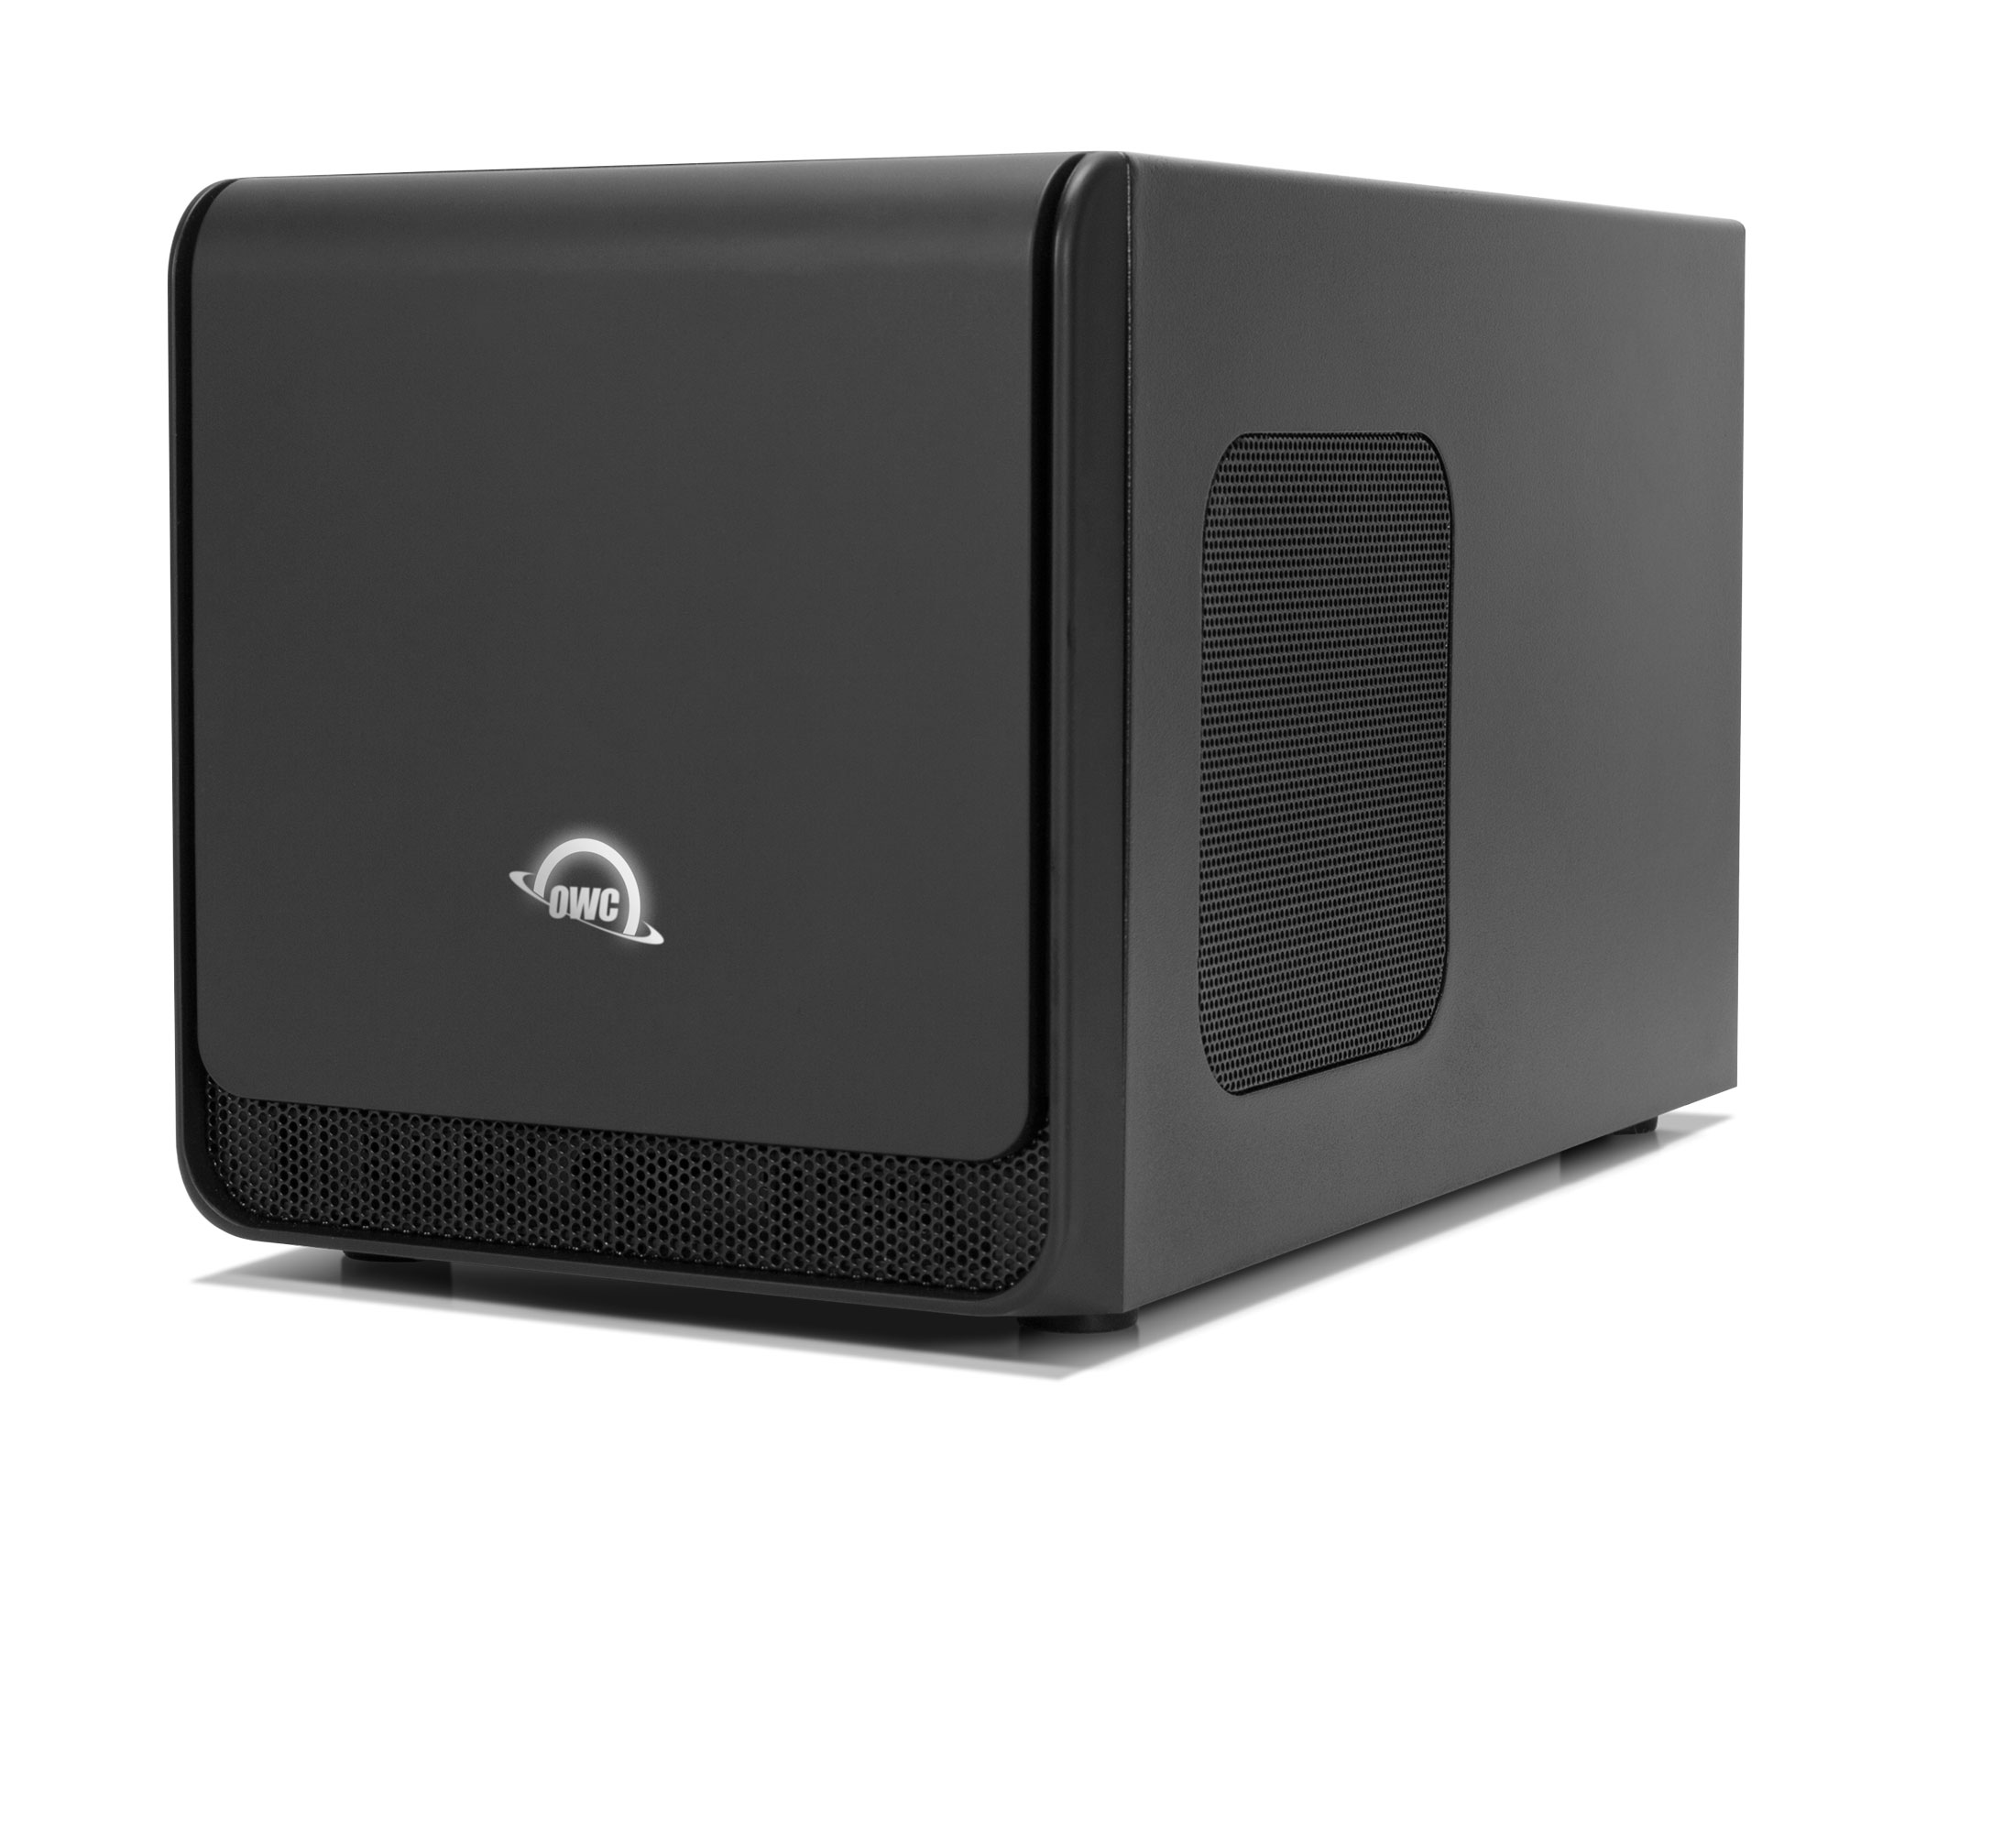 OWC Mercury Helios FX 650 Review: Supercharge your Laptop